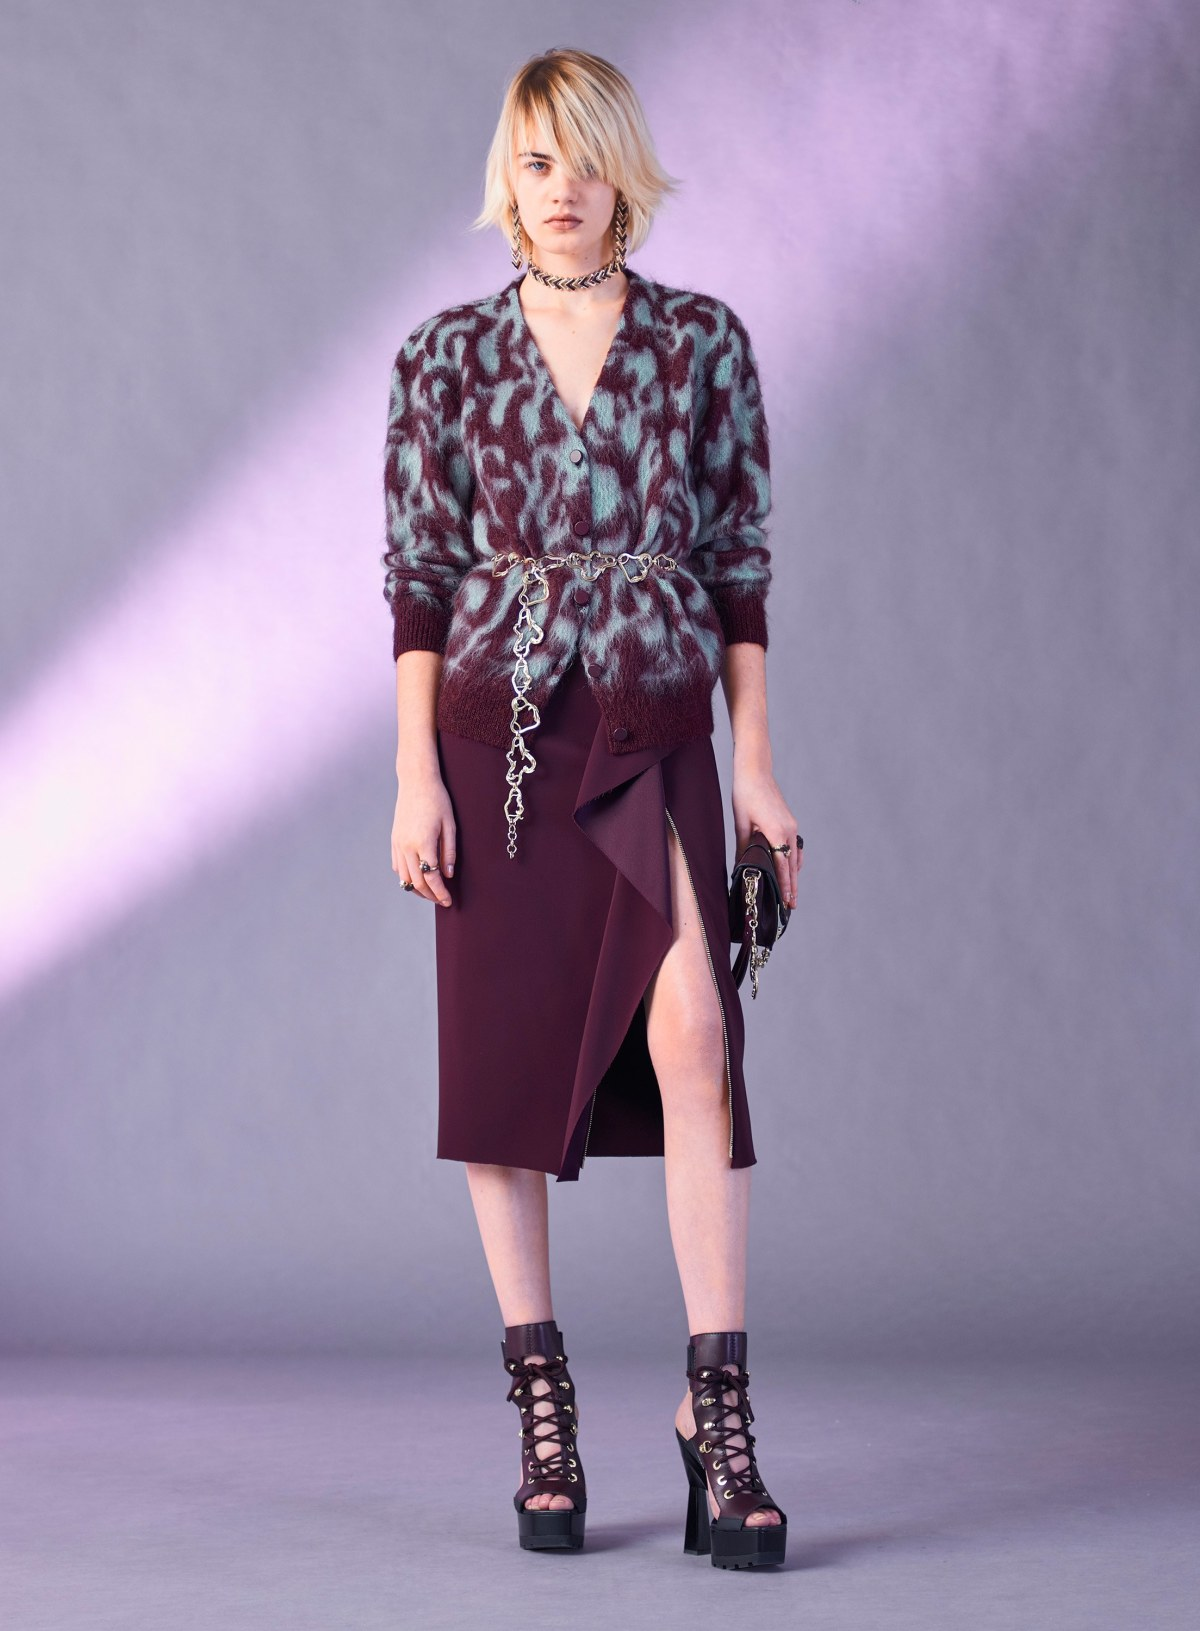 versace-pre-fall-2017-fashion-show-the-impression-17